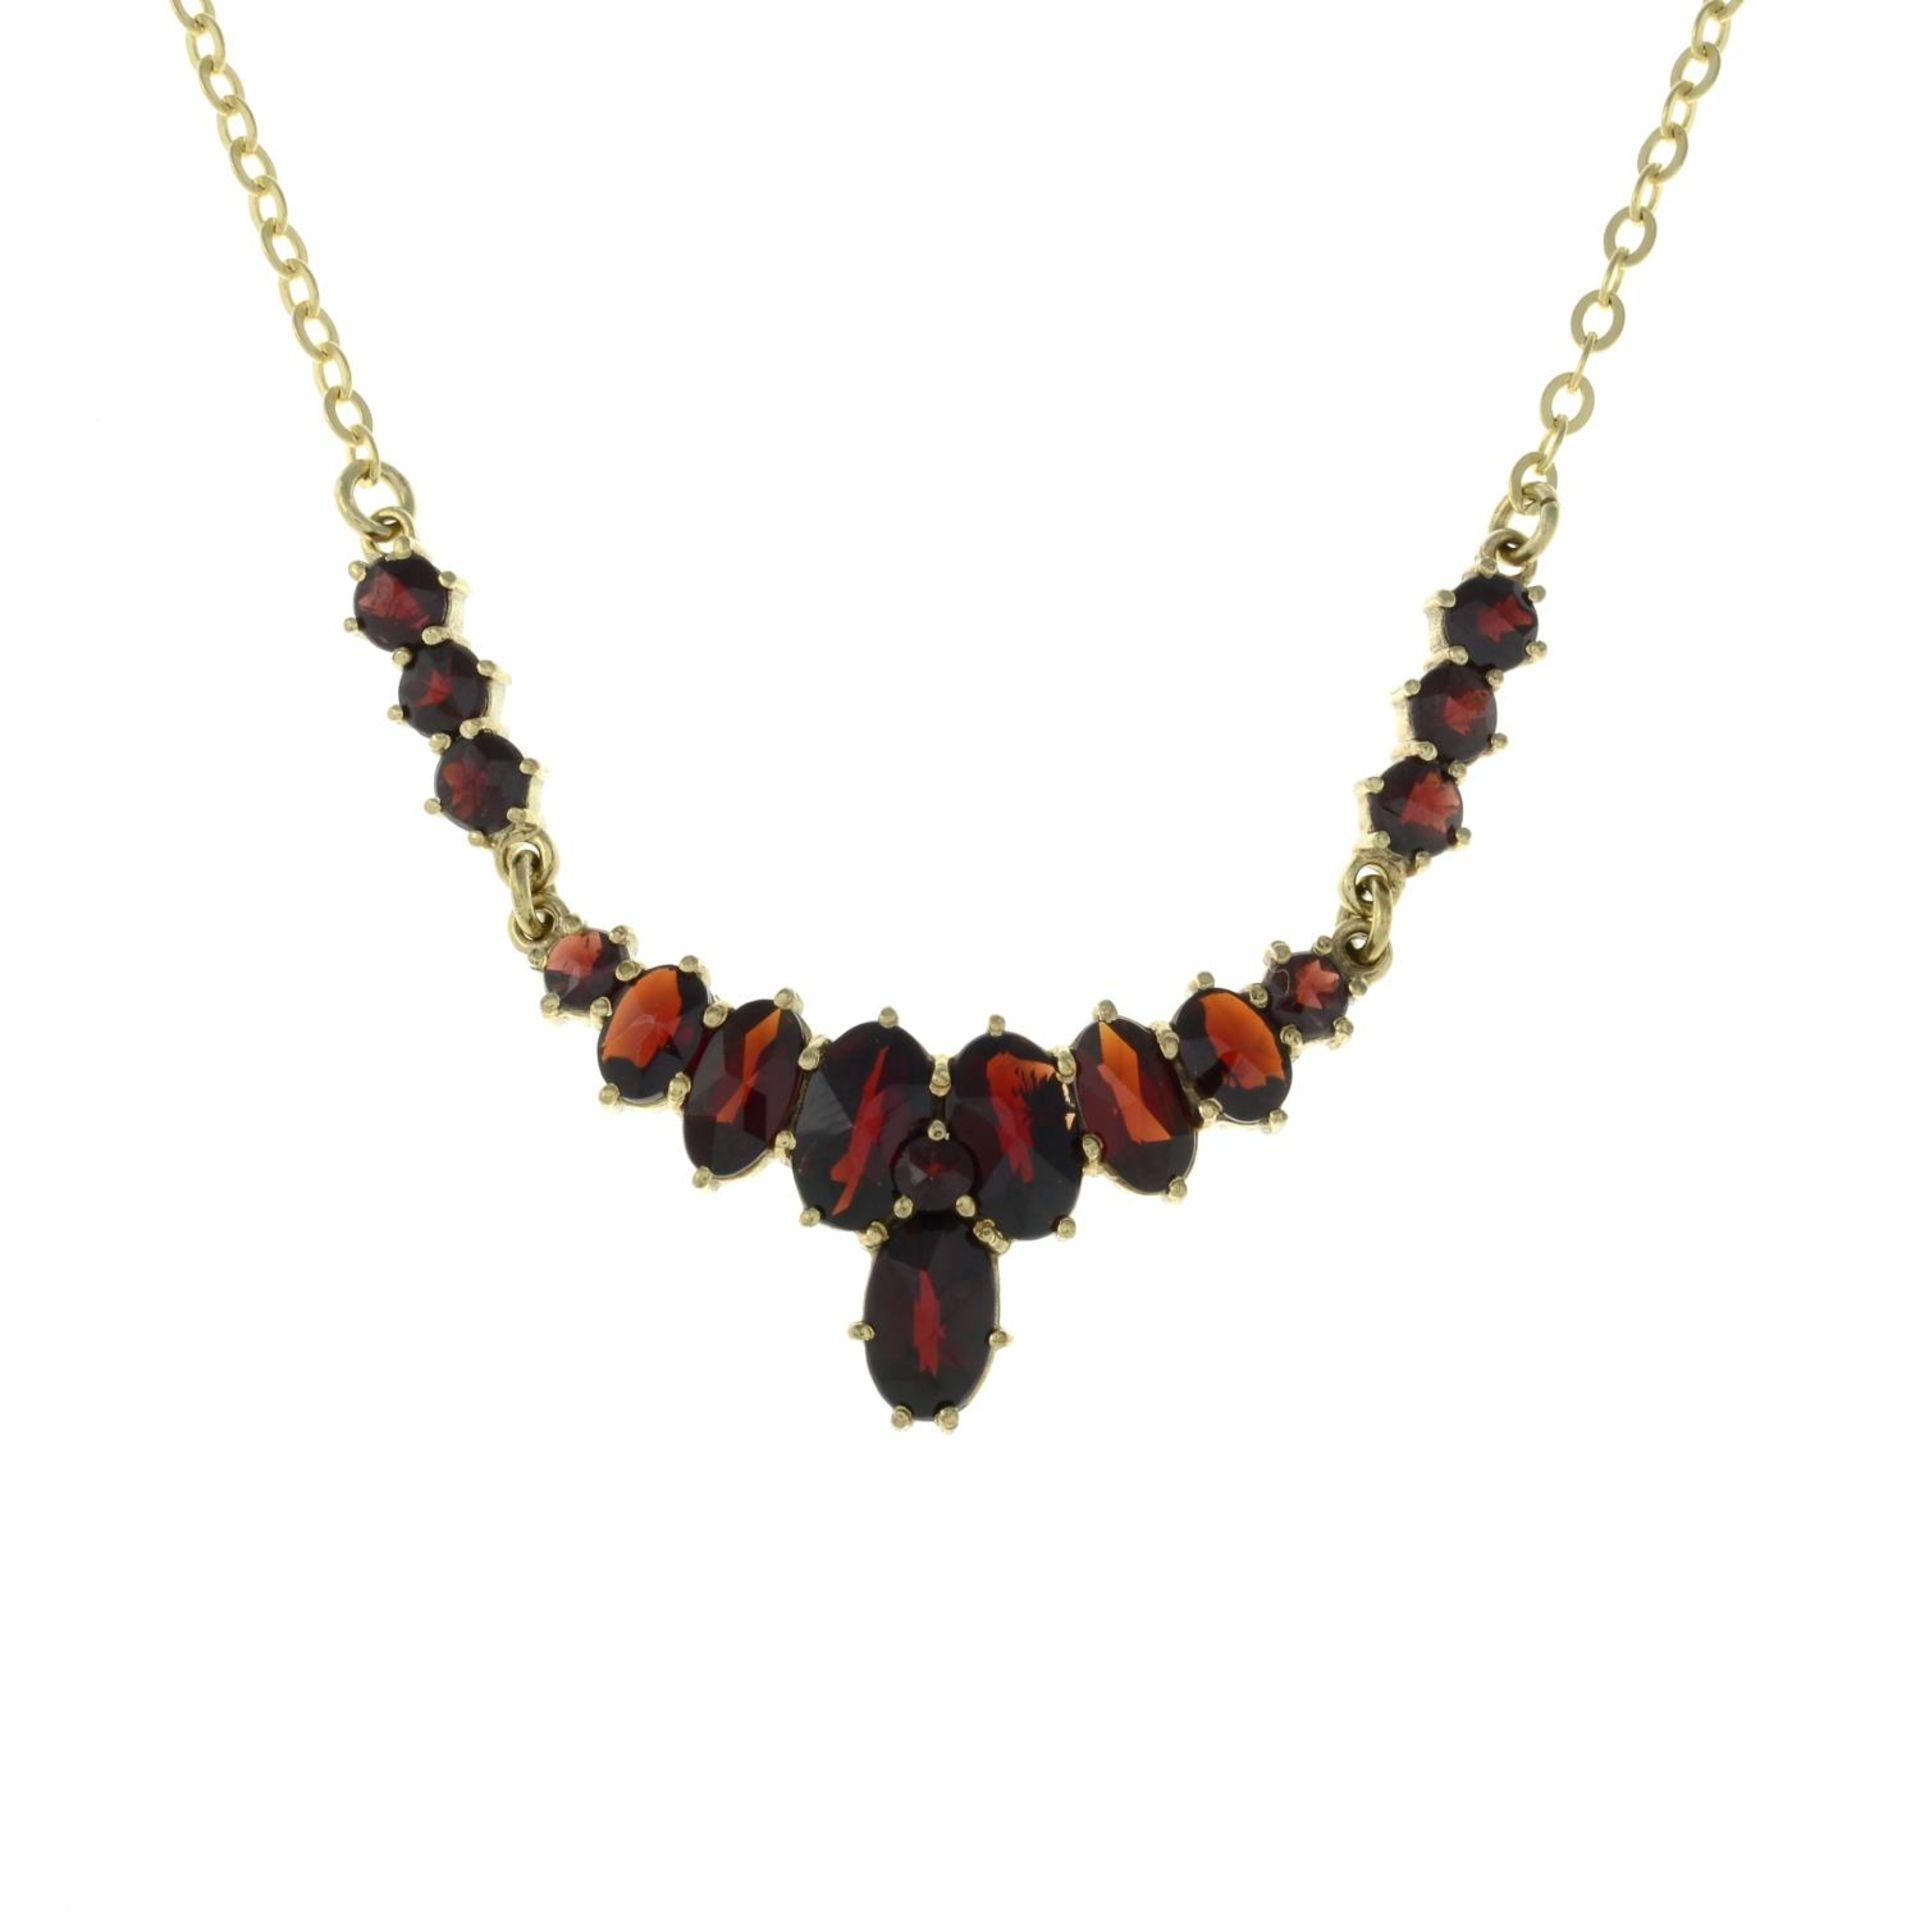 A bohemian garnet necklace.